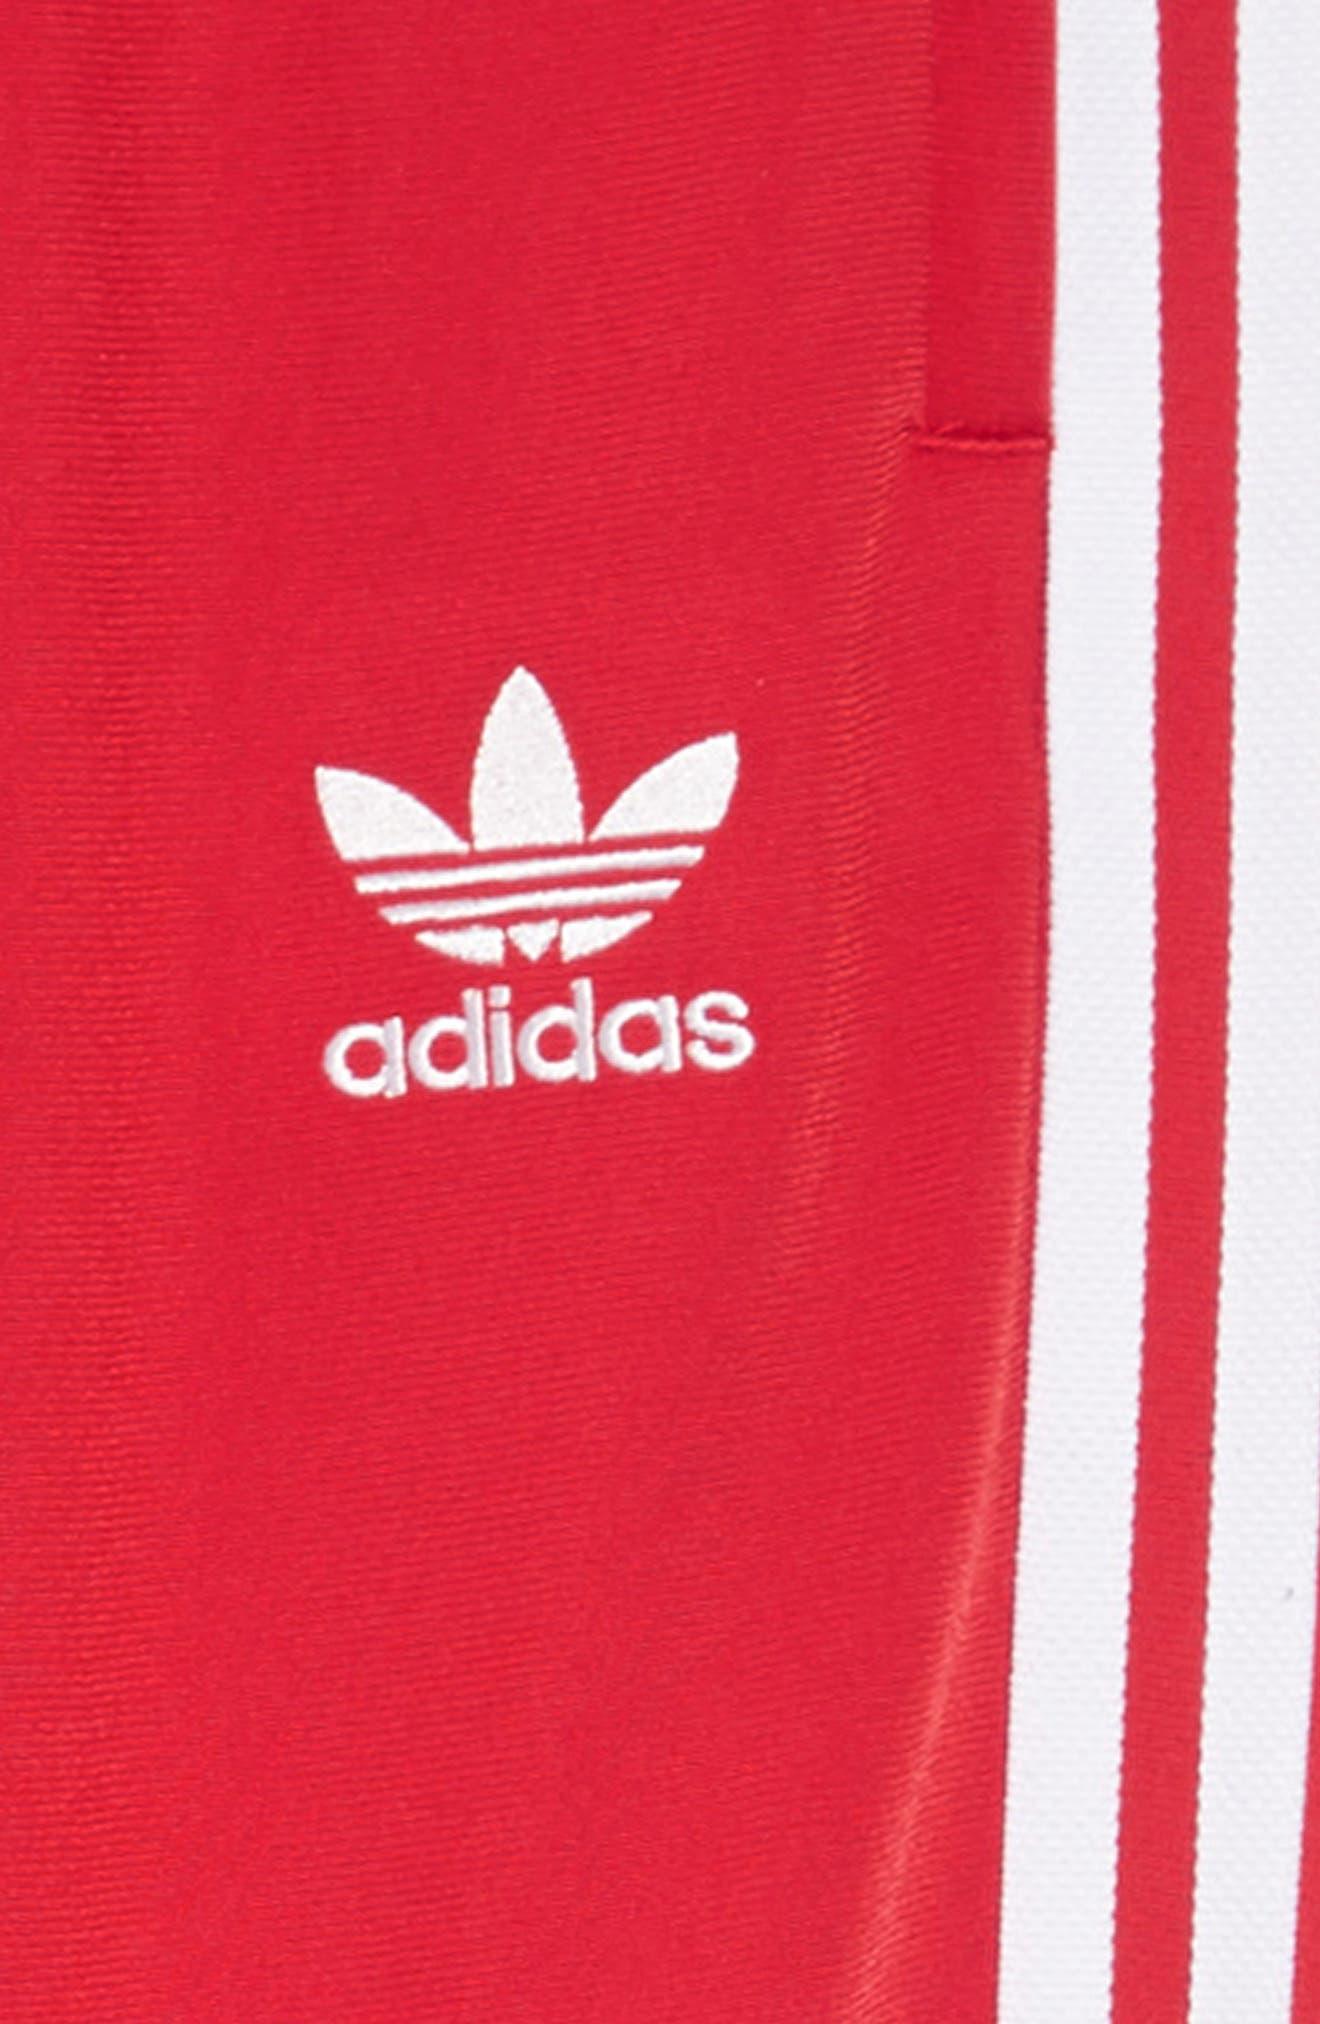 Superstar Track Pants,                             Alternate thumbnail 2, color,                             COLLEGIATE RED/ WHITE